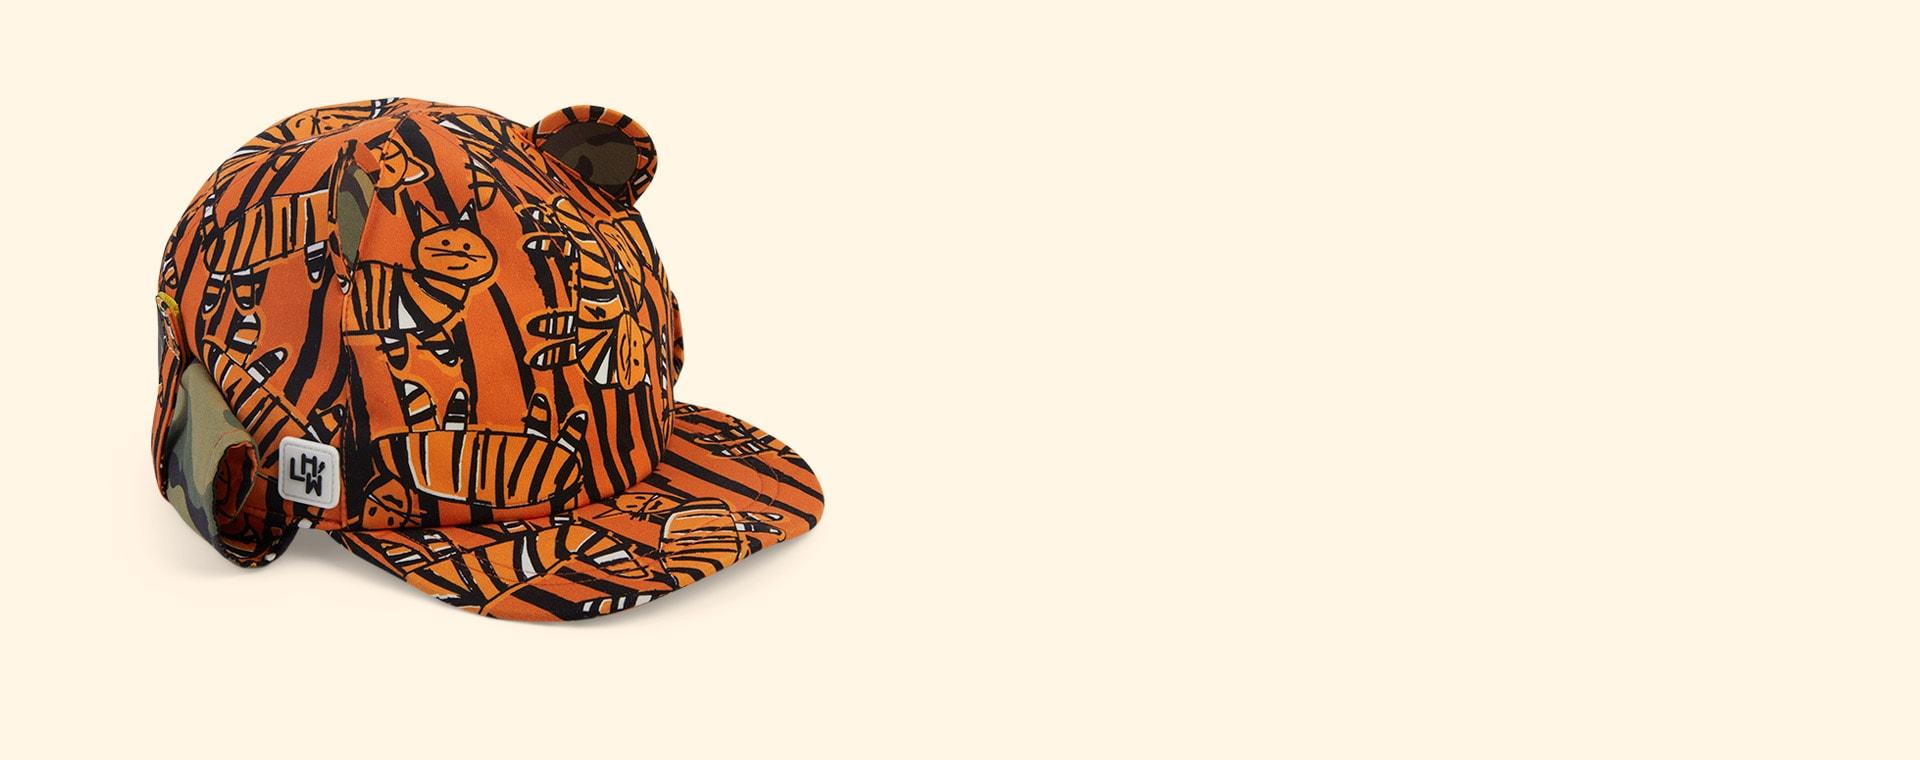 Tiger King Little Hotdog Watson The Cub Baseball Hat